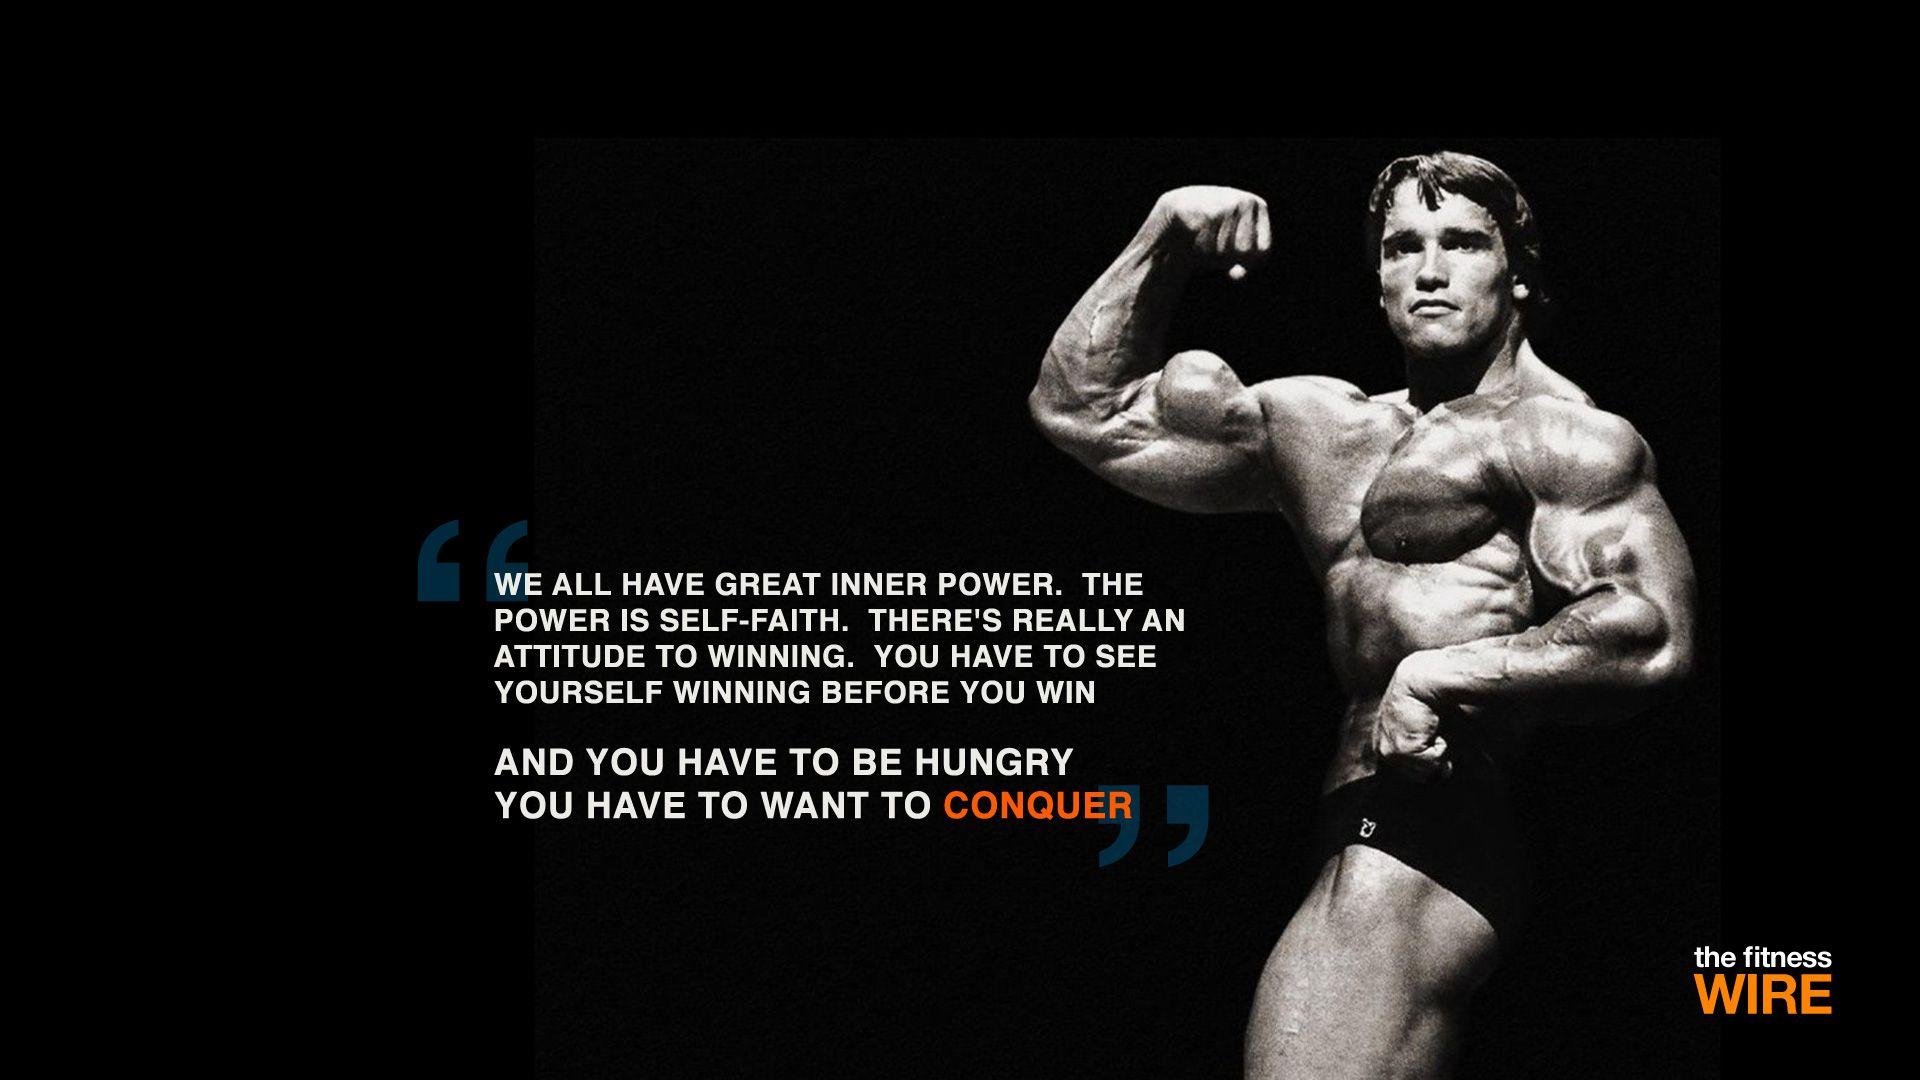 Arnold Motivational Wallpapers WallpaperSafari